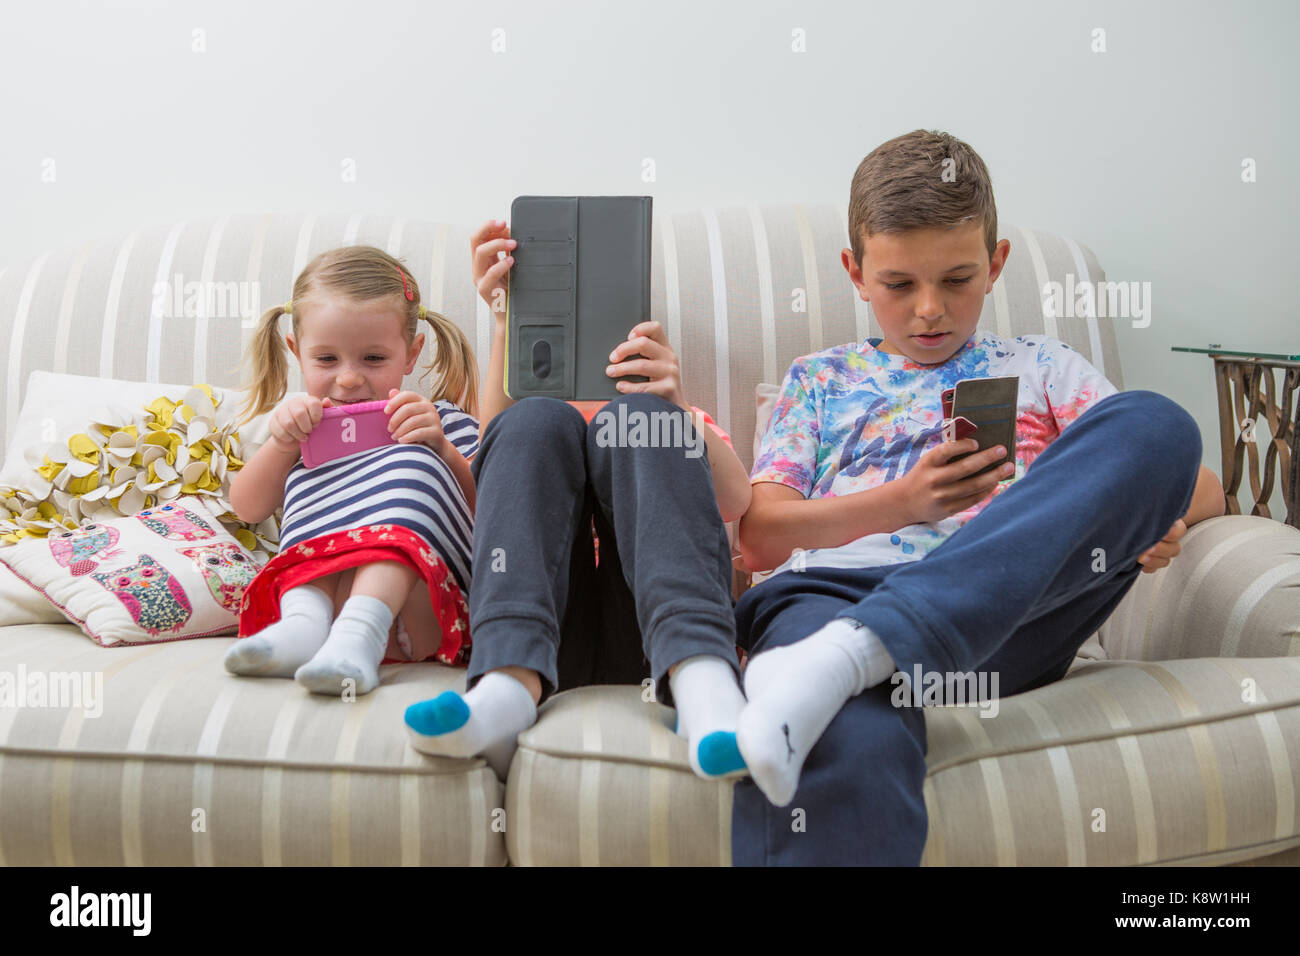 children using technology for gaming - Stock Image